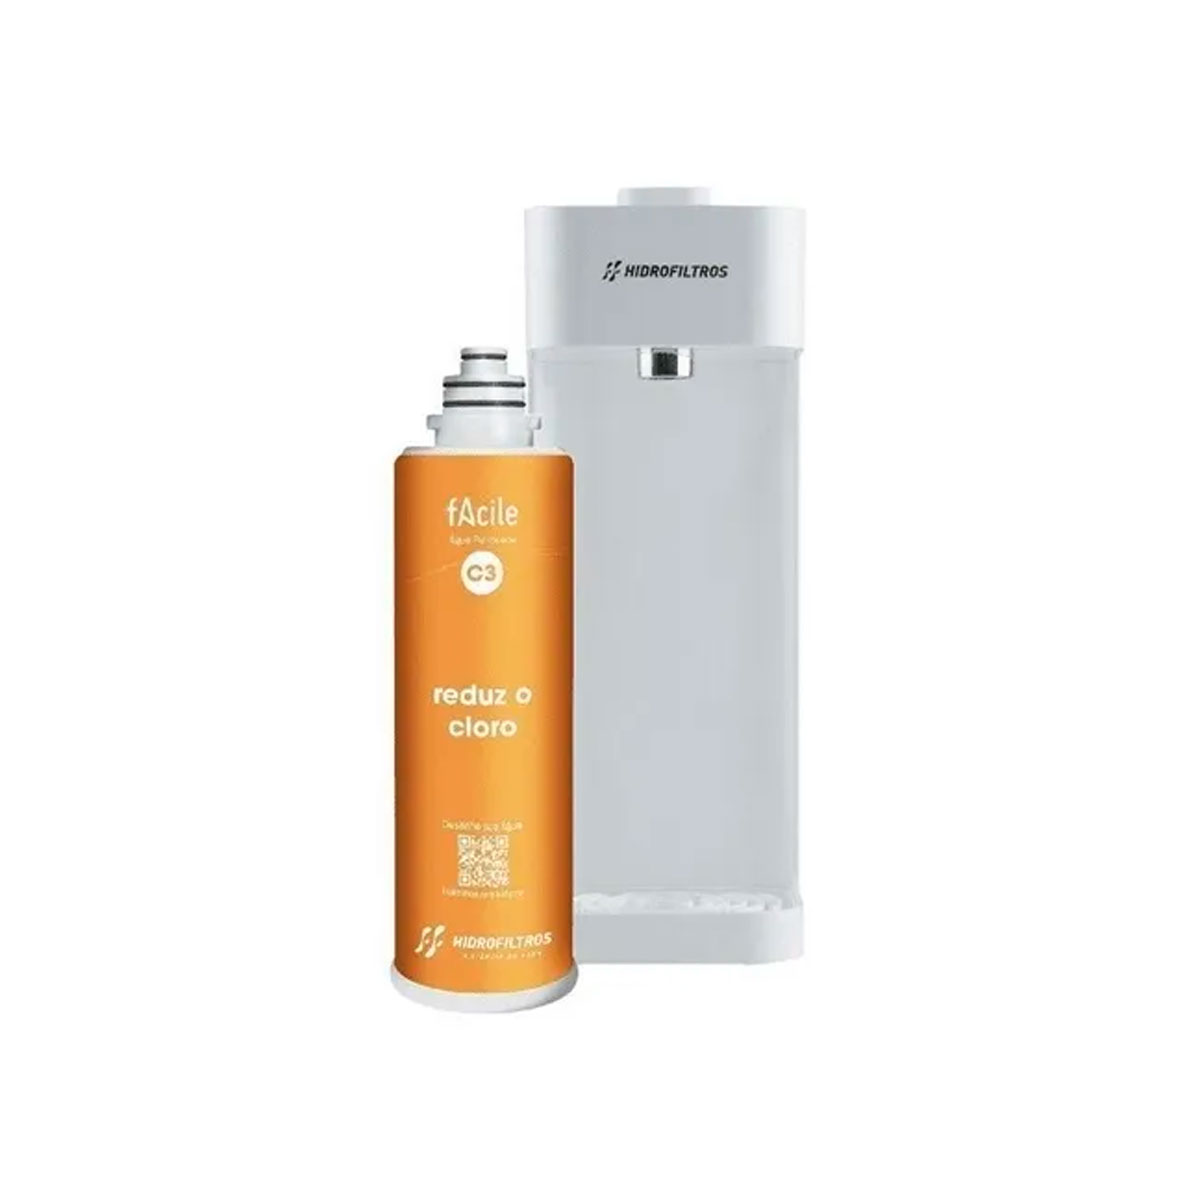 Purificador De Agua Hidro Filtros Facile C3 Branco